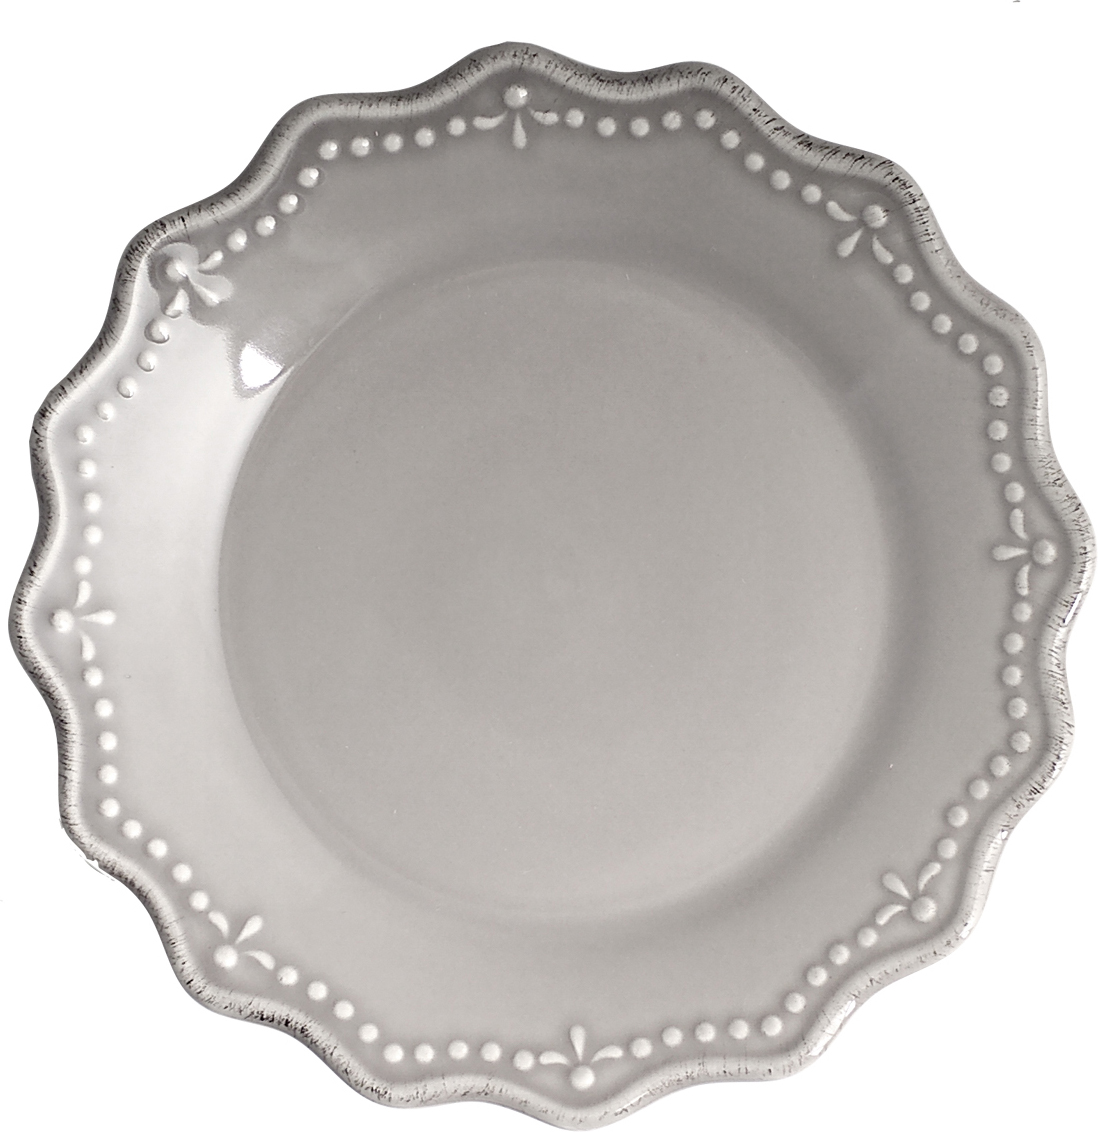 Тарелка десертная H&, цвет: серый, диаметр 21 см